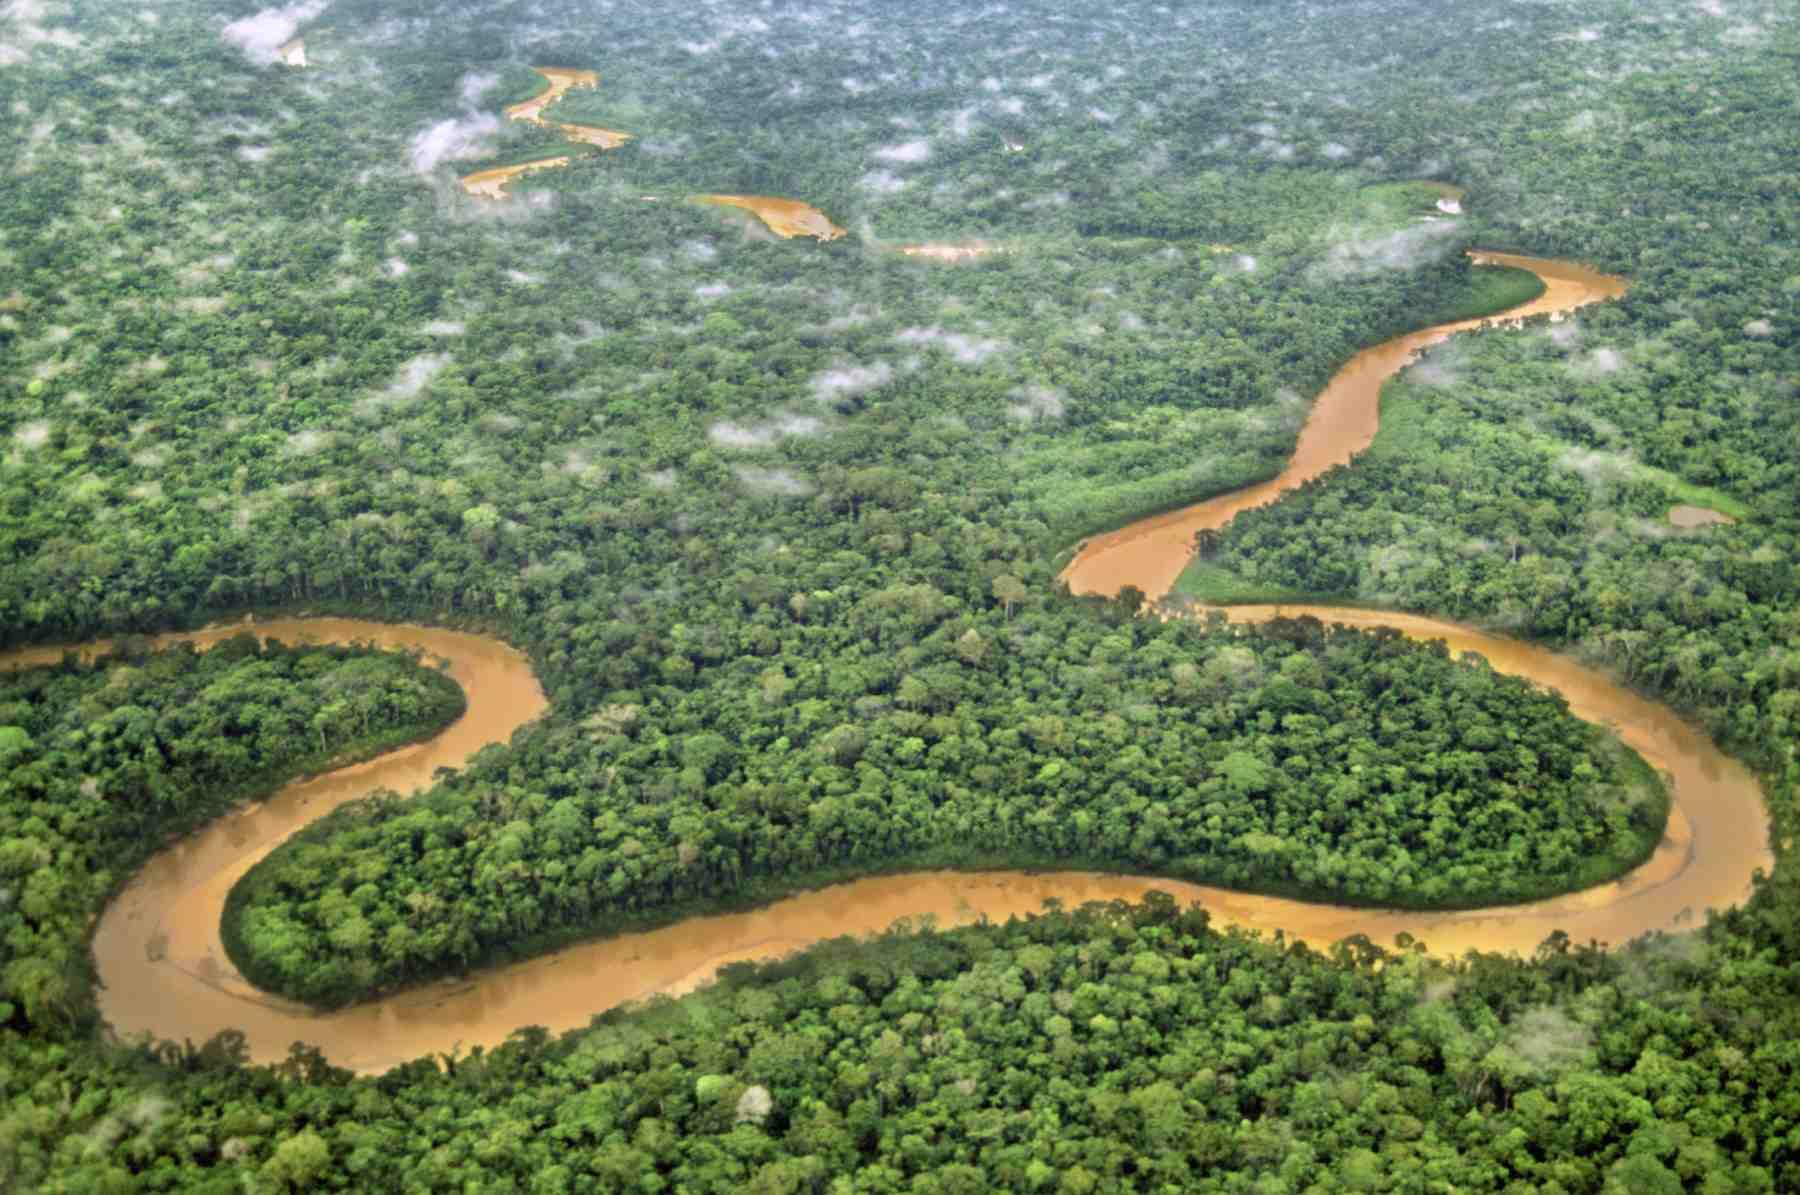 Aerial photo of Tambopata National Reserve